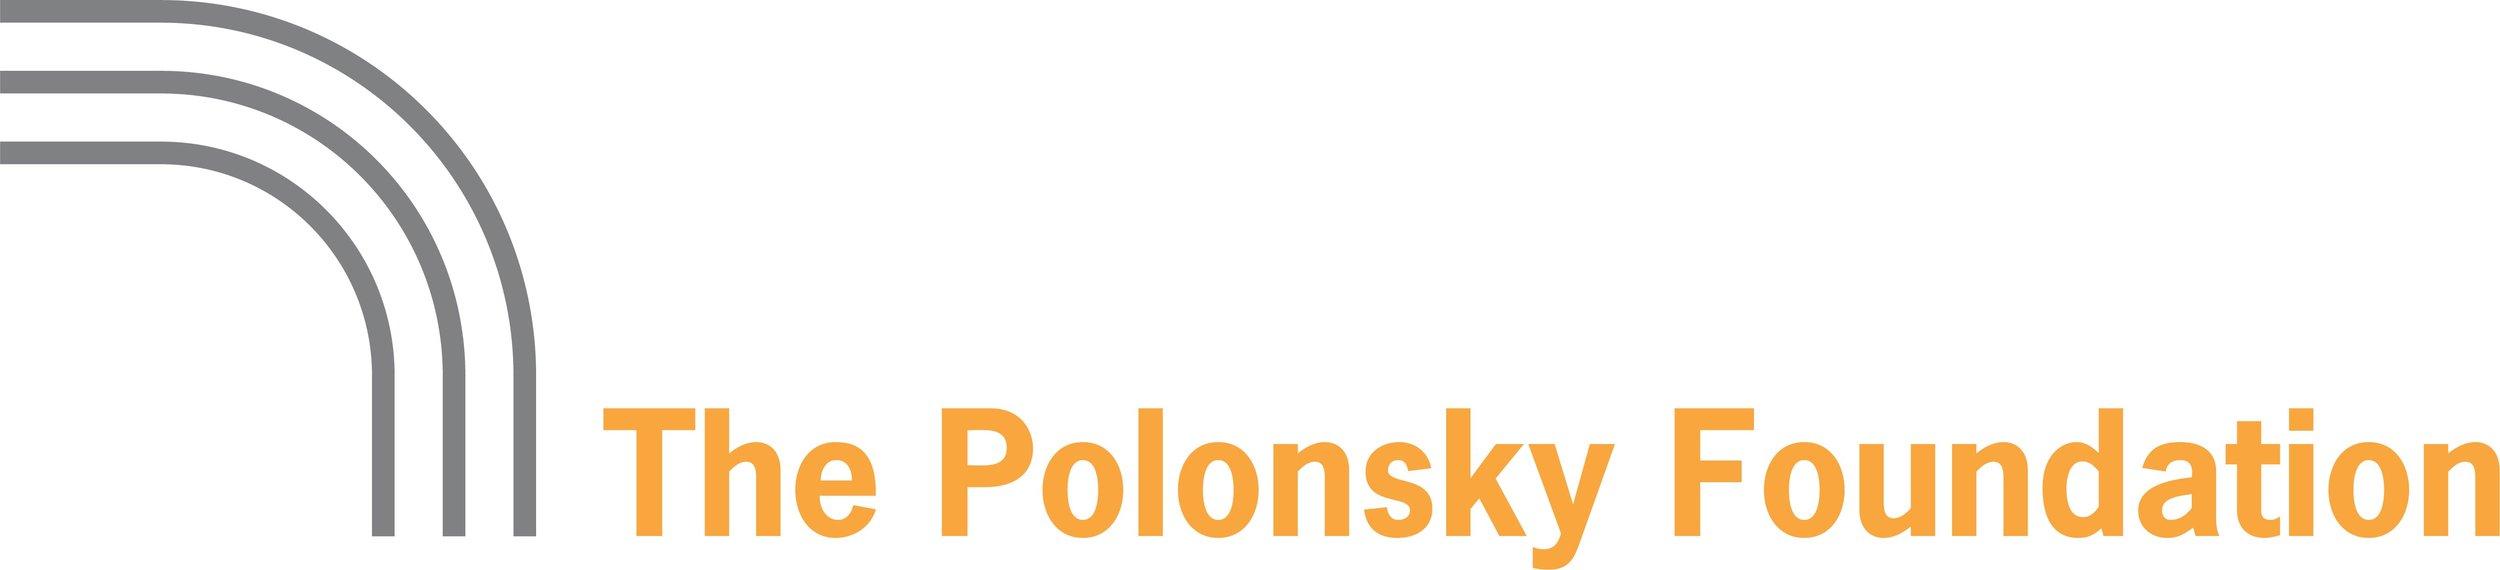 Polonsky logo rgb.72dpi.jpg